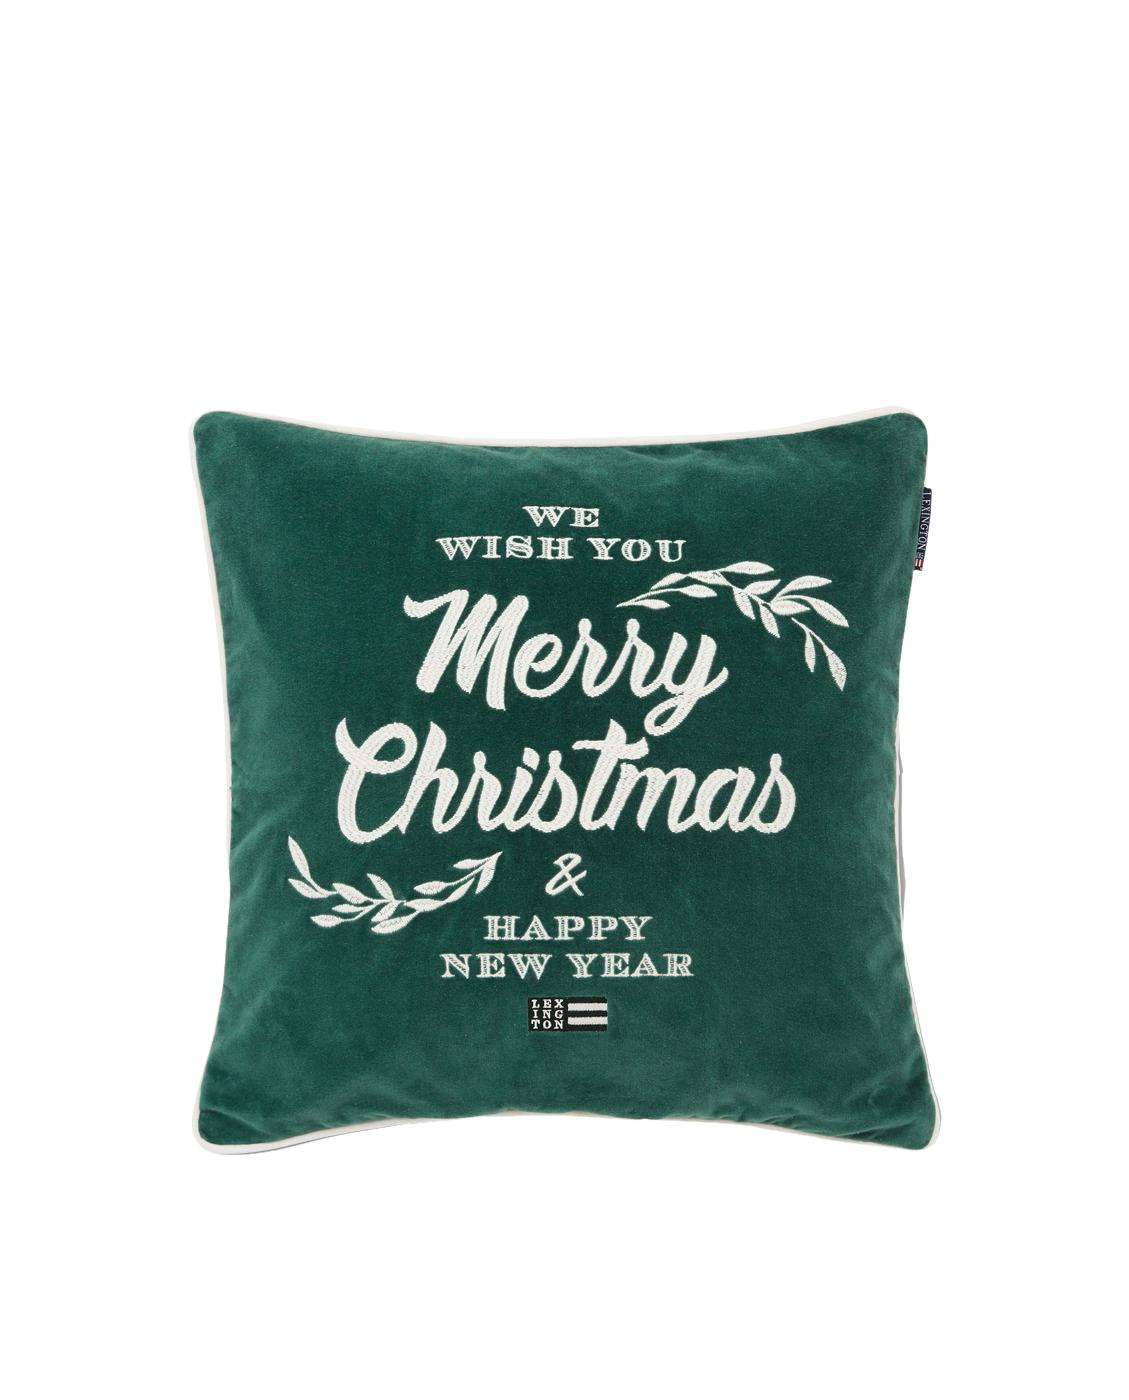 Federa arredo in velluto con scritta Merry Christmas, Cotone, Bianco, verde, Larg. 50 x Lung. 50 cm